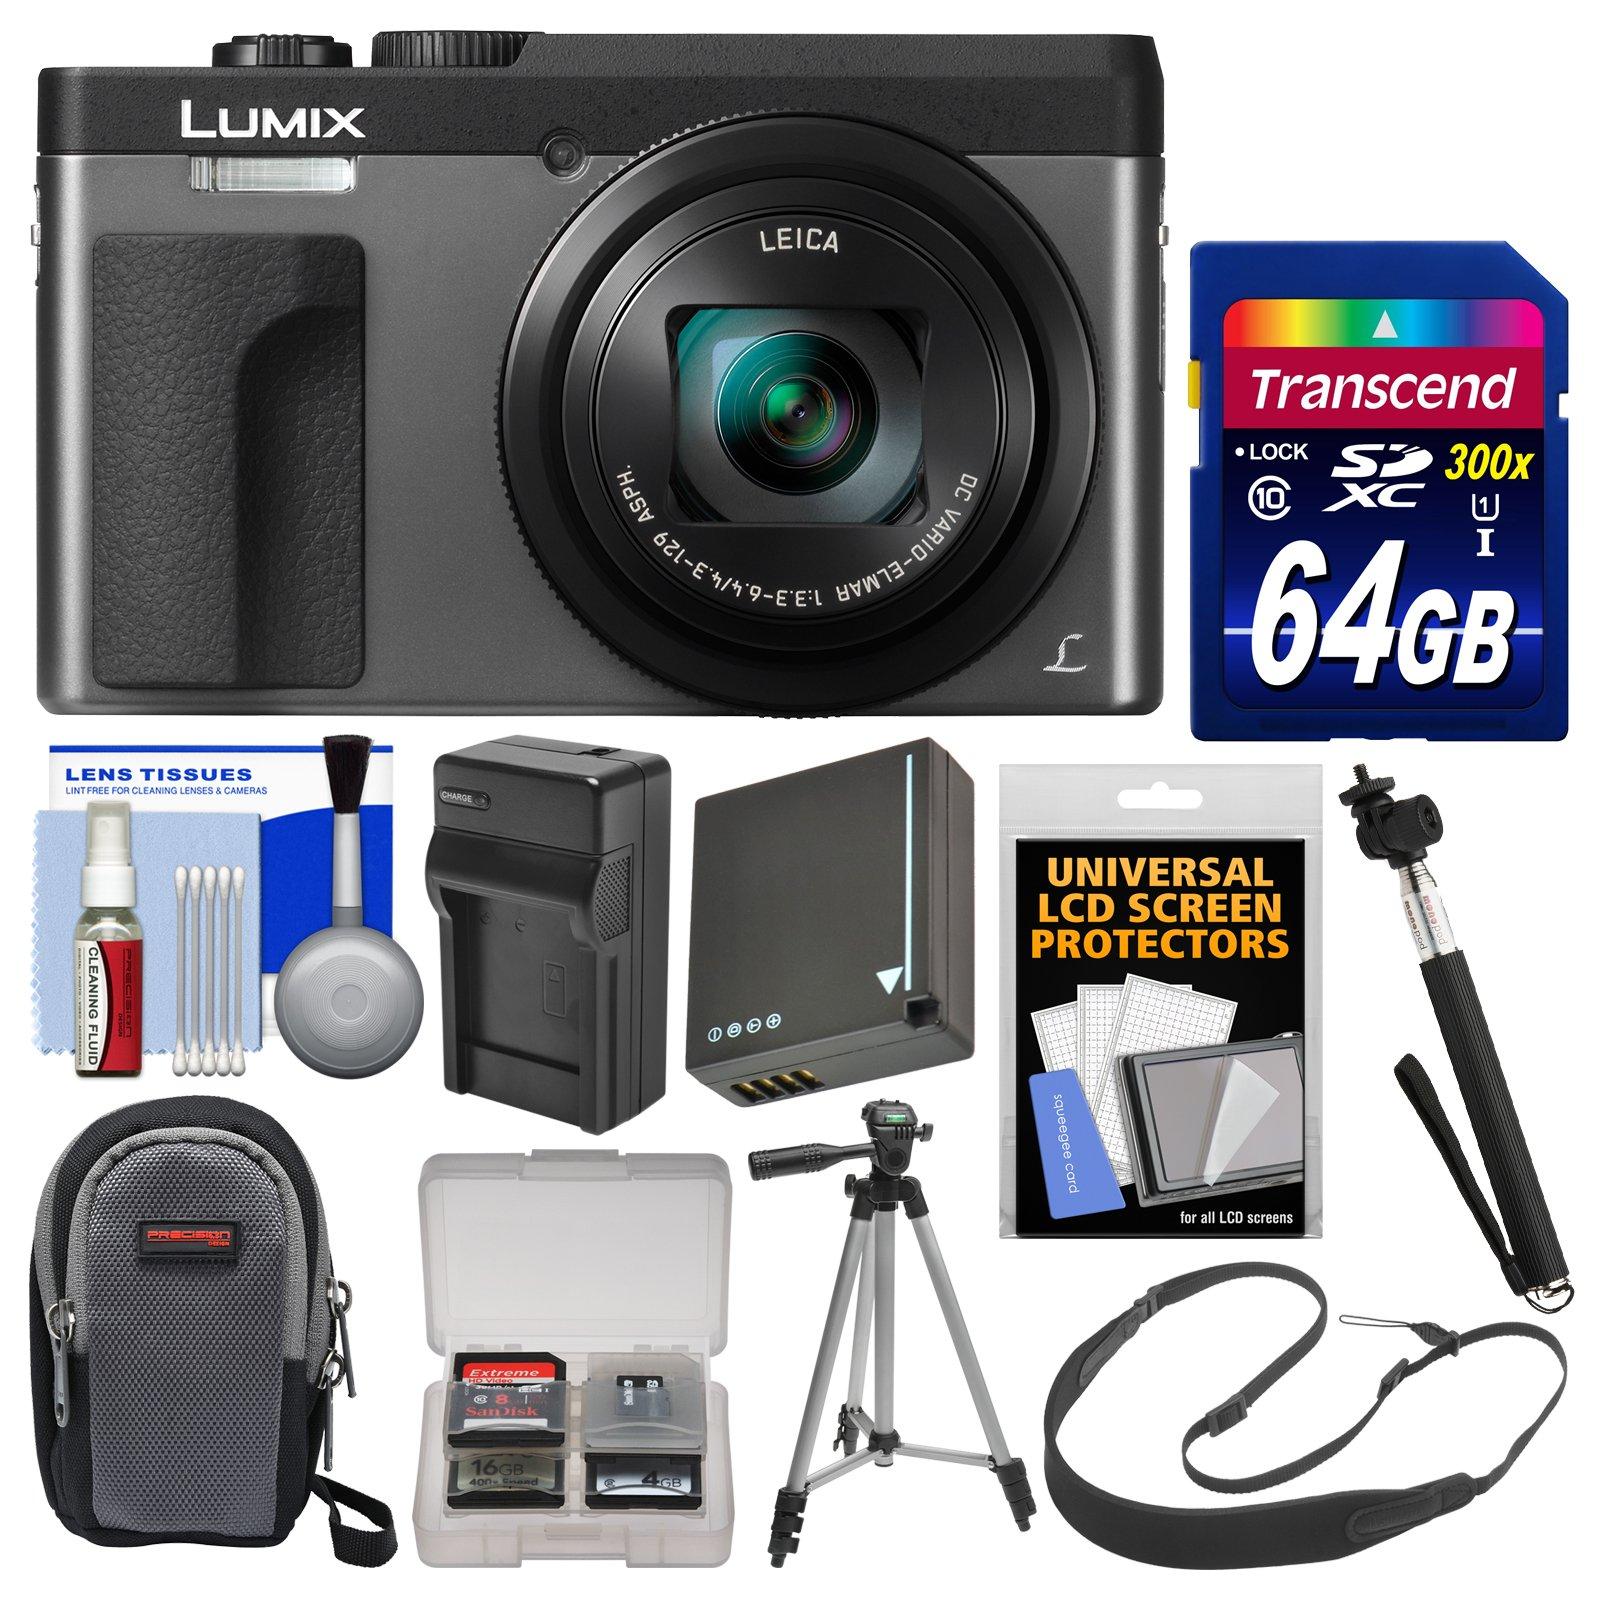 Panasonic Lumix DC-ZS70 4K Wi-Fi Digital Camera (Silver) with 64GB Card + Case + Battery & Charger + Monopod + Tripod + Strap + Cleaning Kit by Panasonic